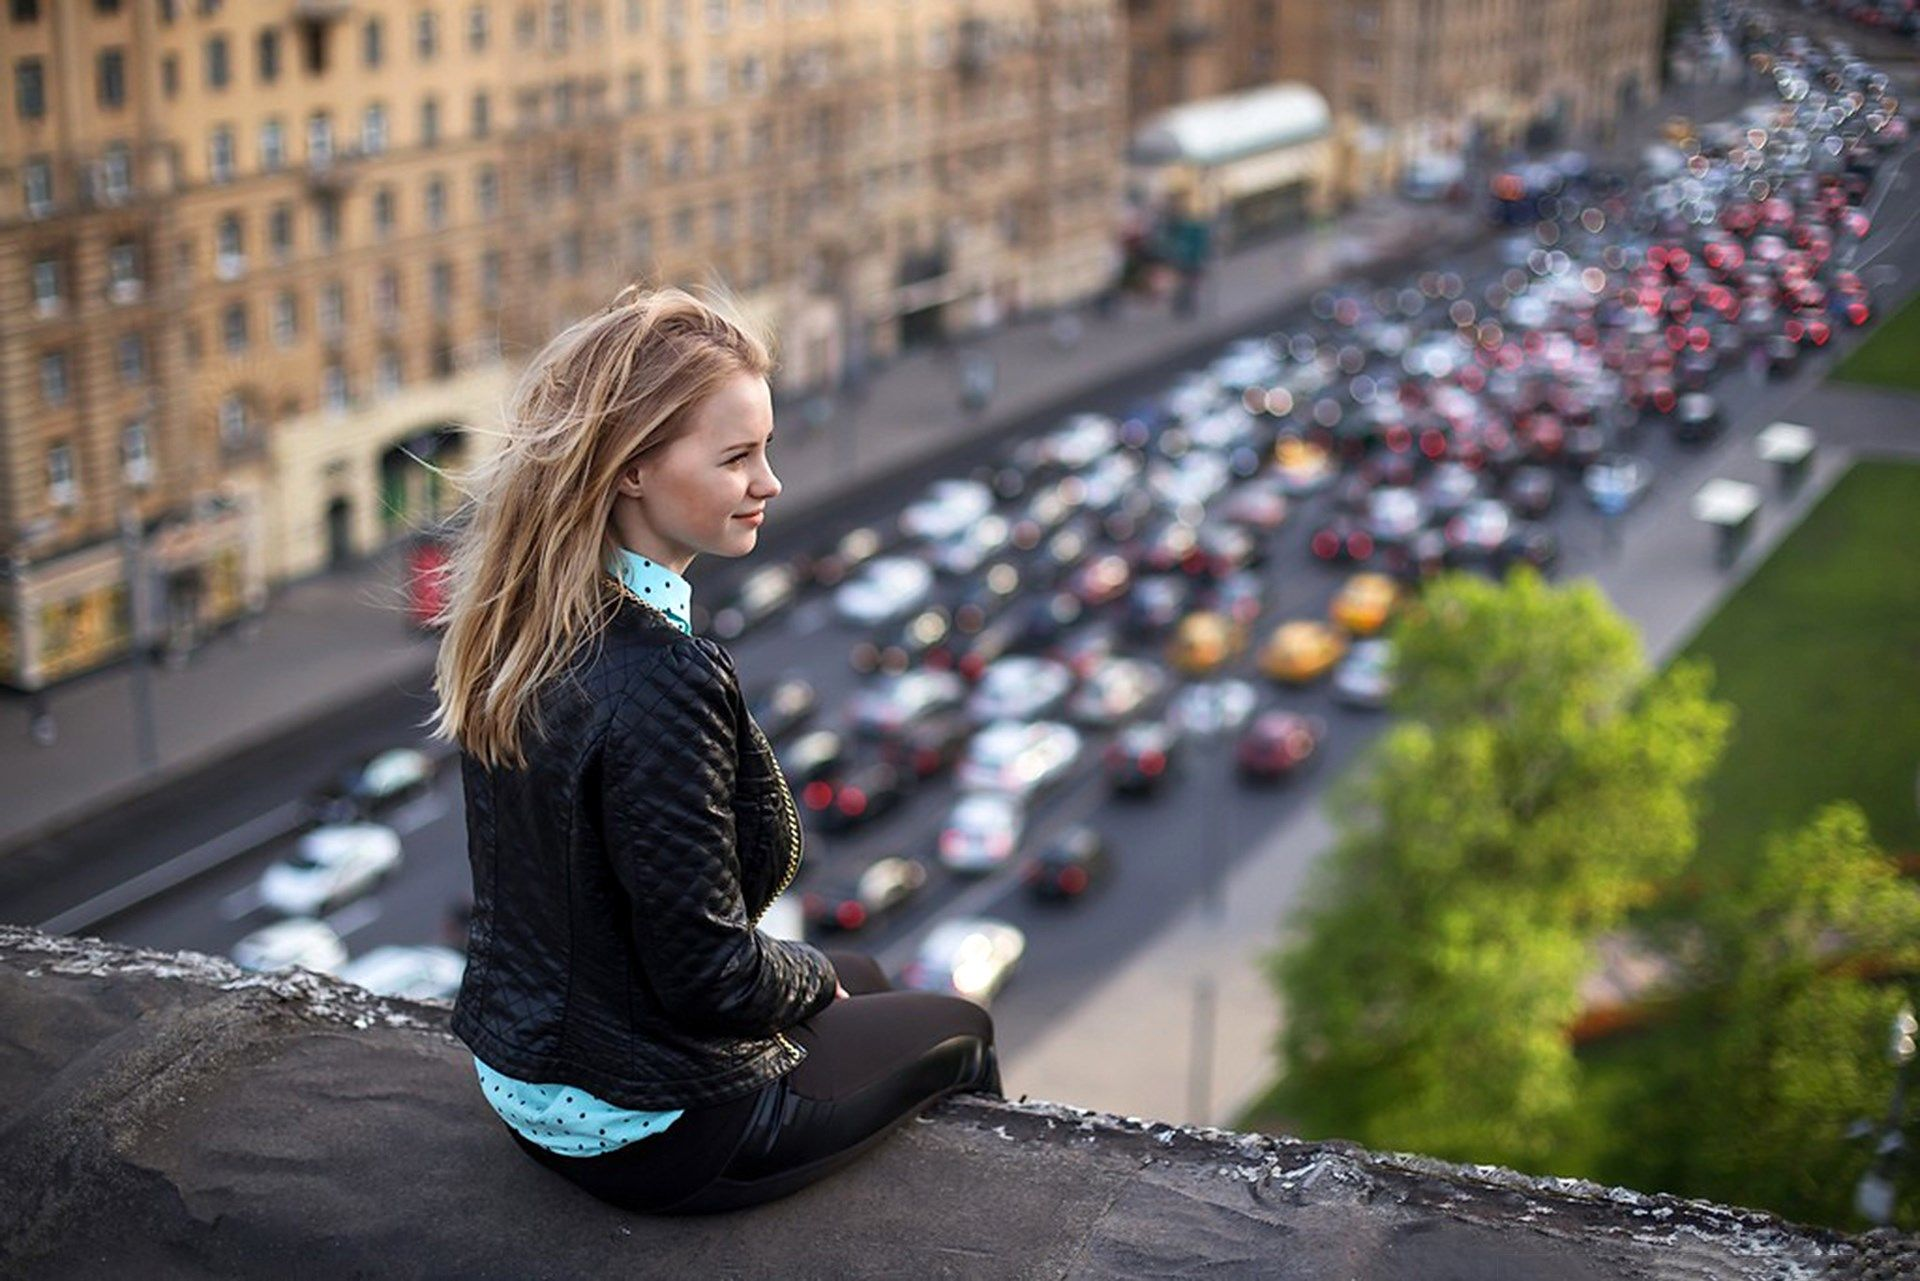 Clara alonso computer wallpapers desktop backgrounds 2560x1600 id - Olga Kobzar Pic Full Hd Backgrounds Olga Kobzar Category Ololoshka Pinterest Hd Backgrounds And Models